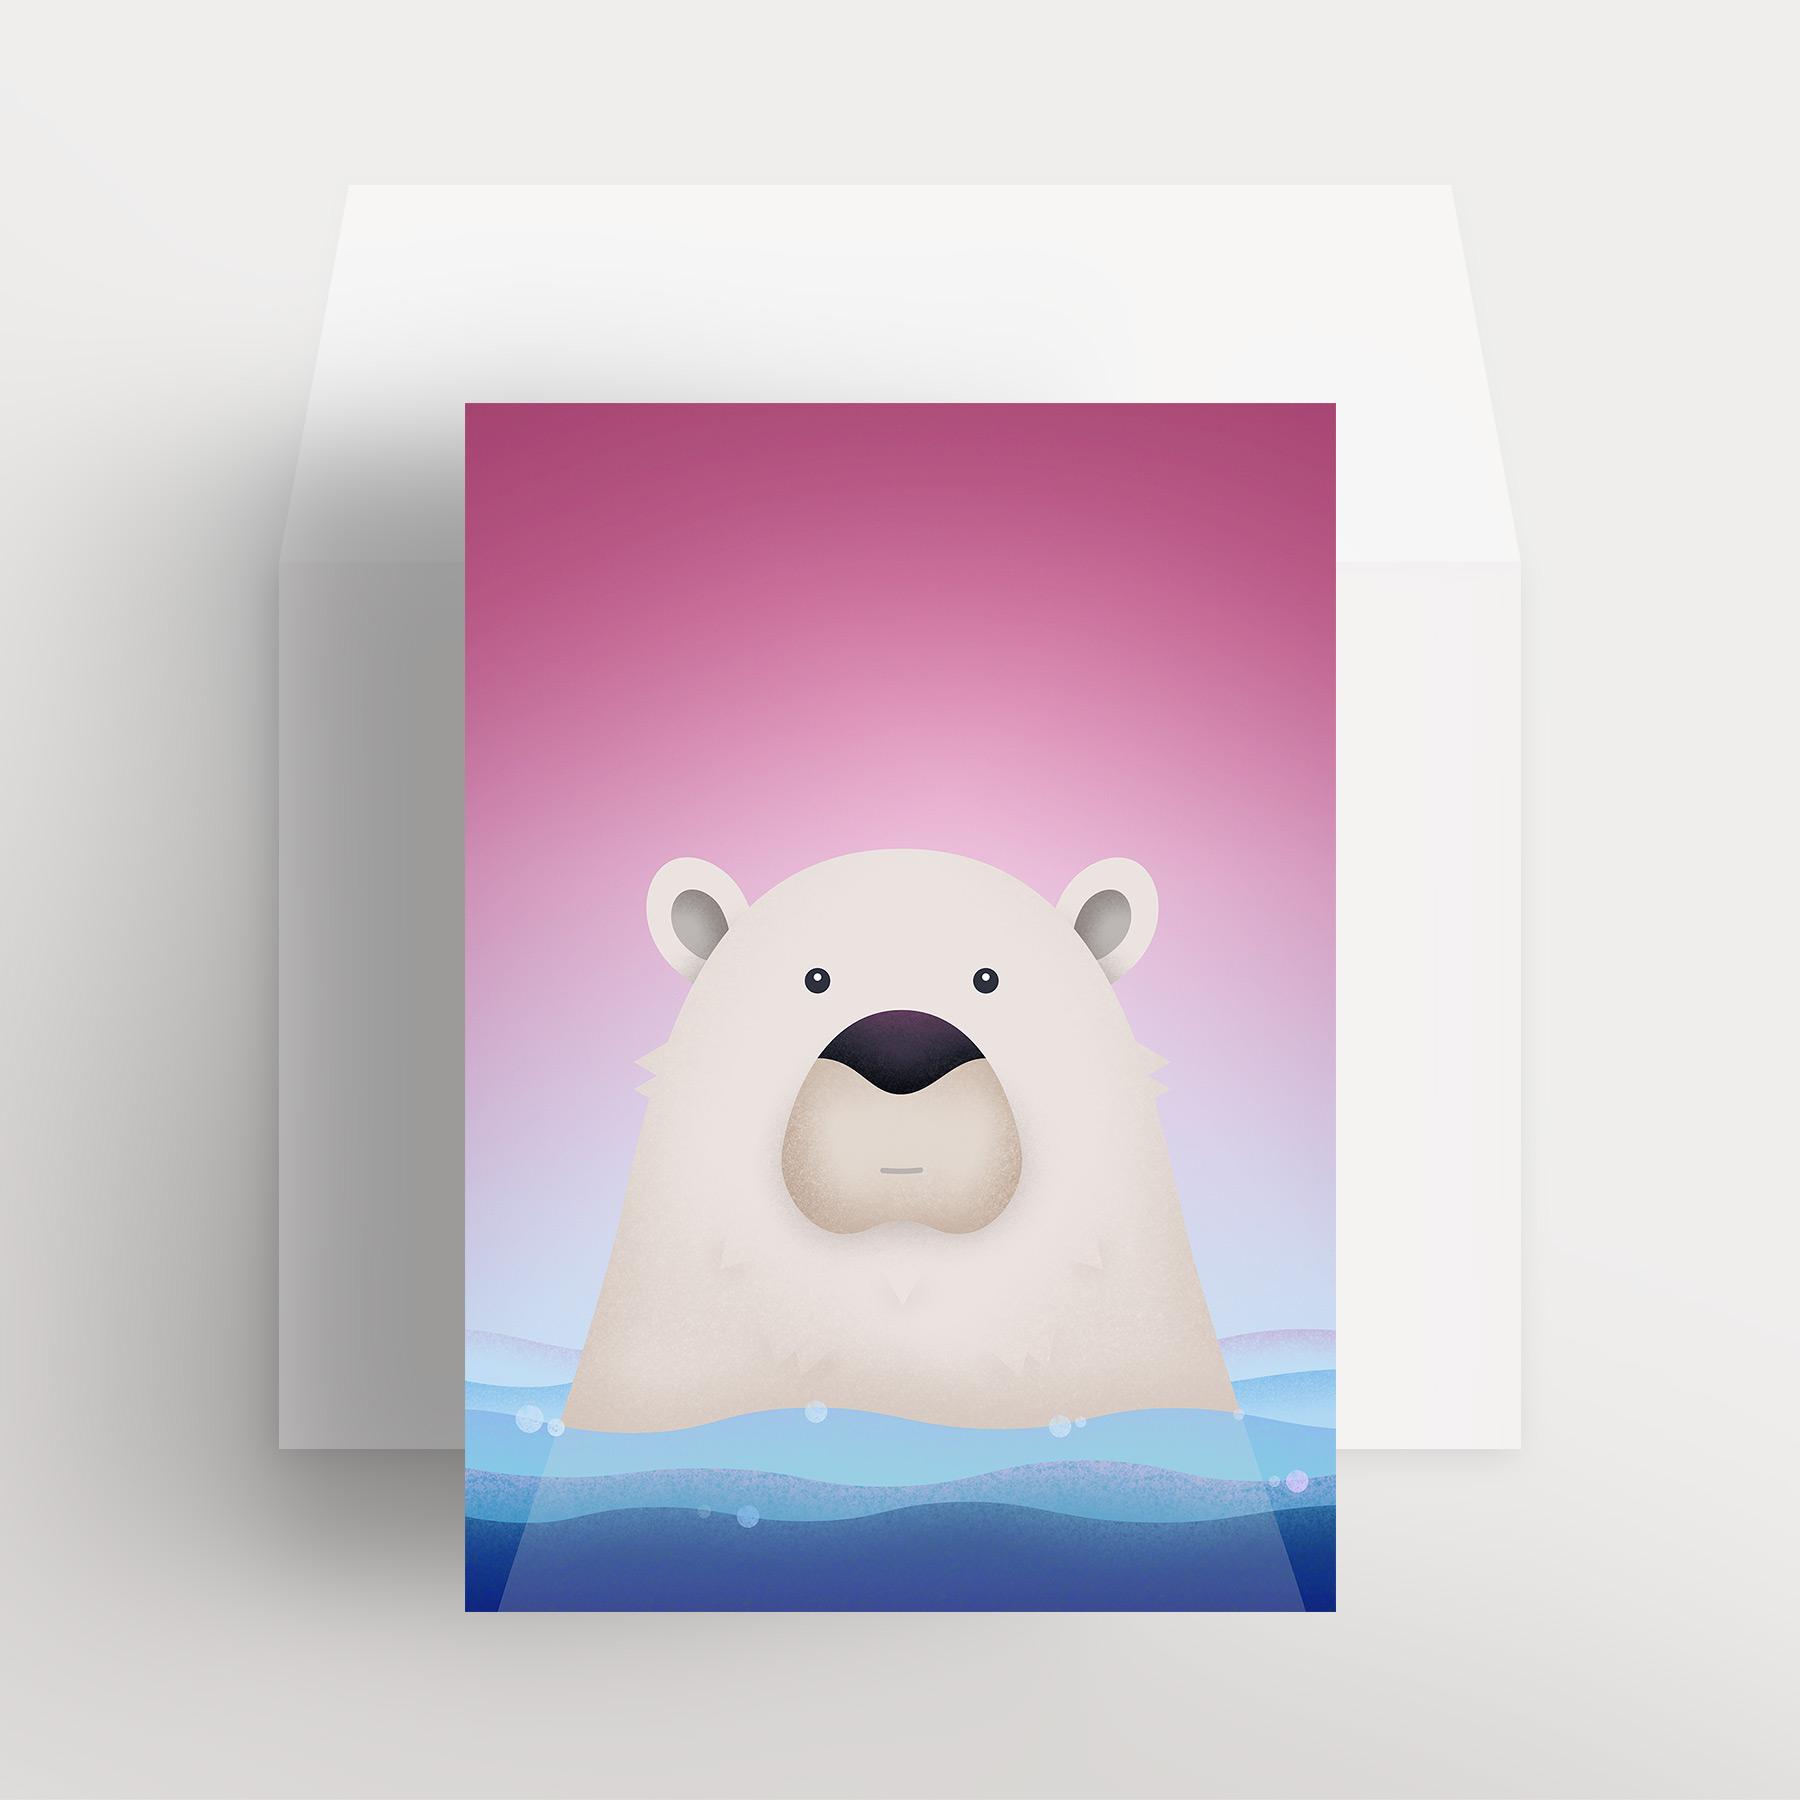 Carte de souhaits – Ours polaire paisible (Rose – Frimas magenta)